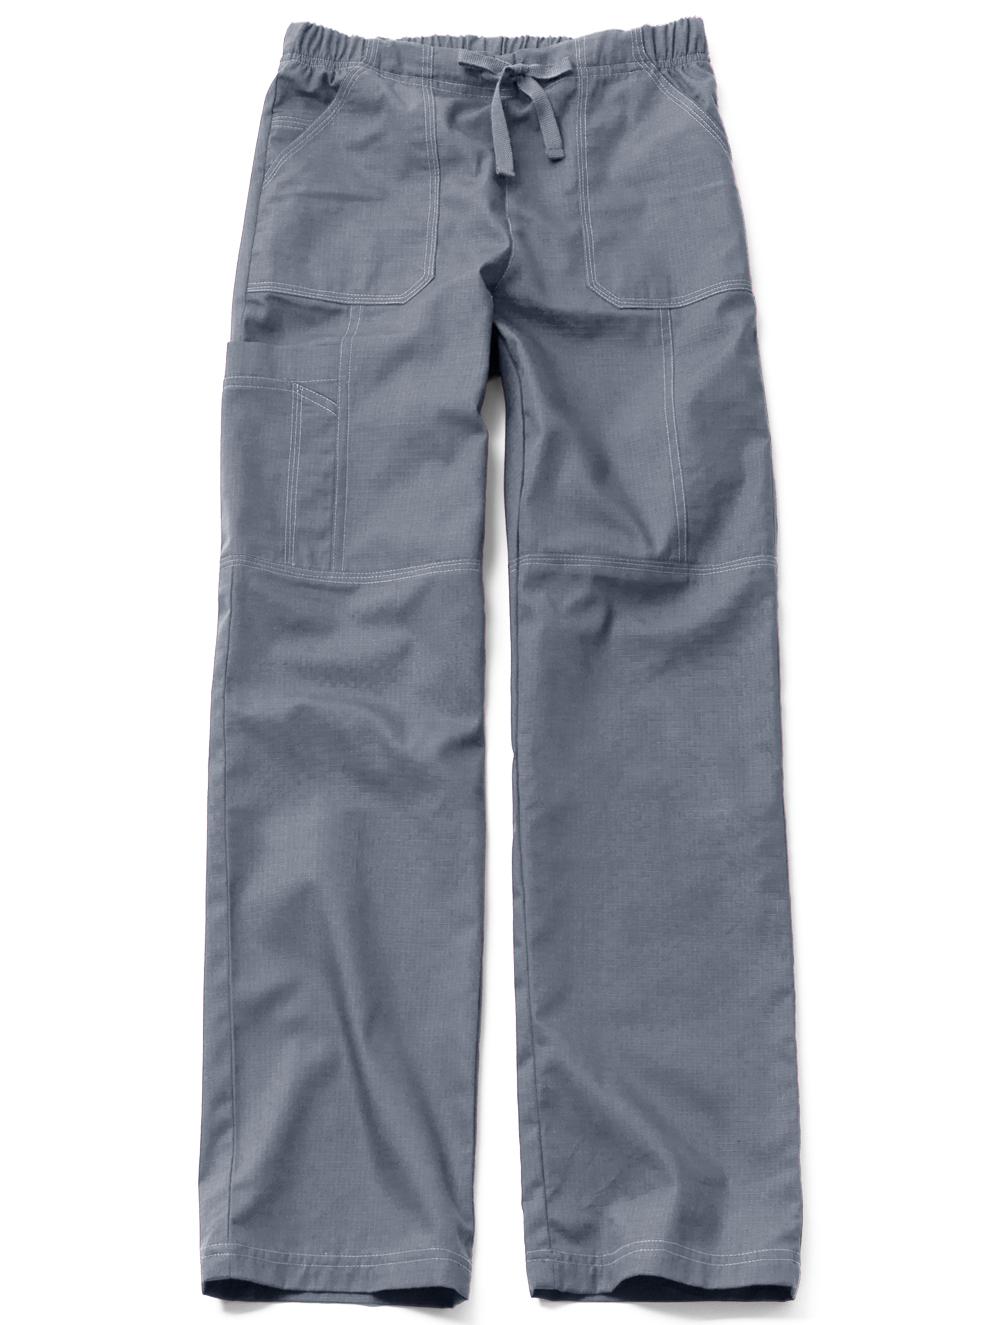 Cool Carhartt Women39s Cargo Pant WB051  MammothWorkwearcom